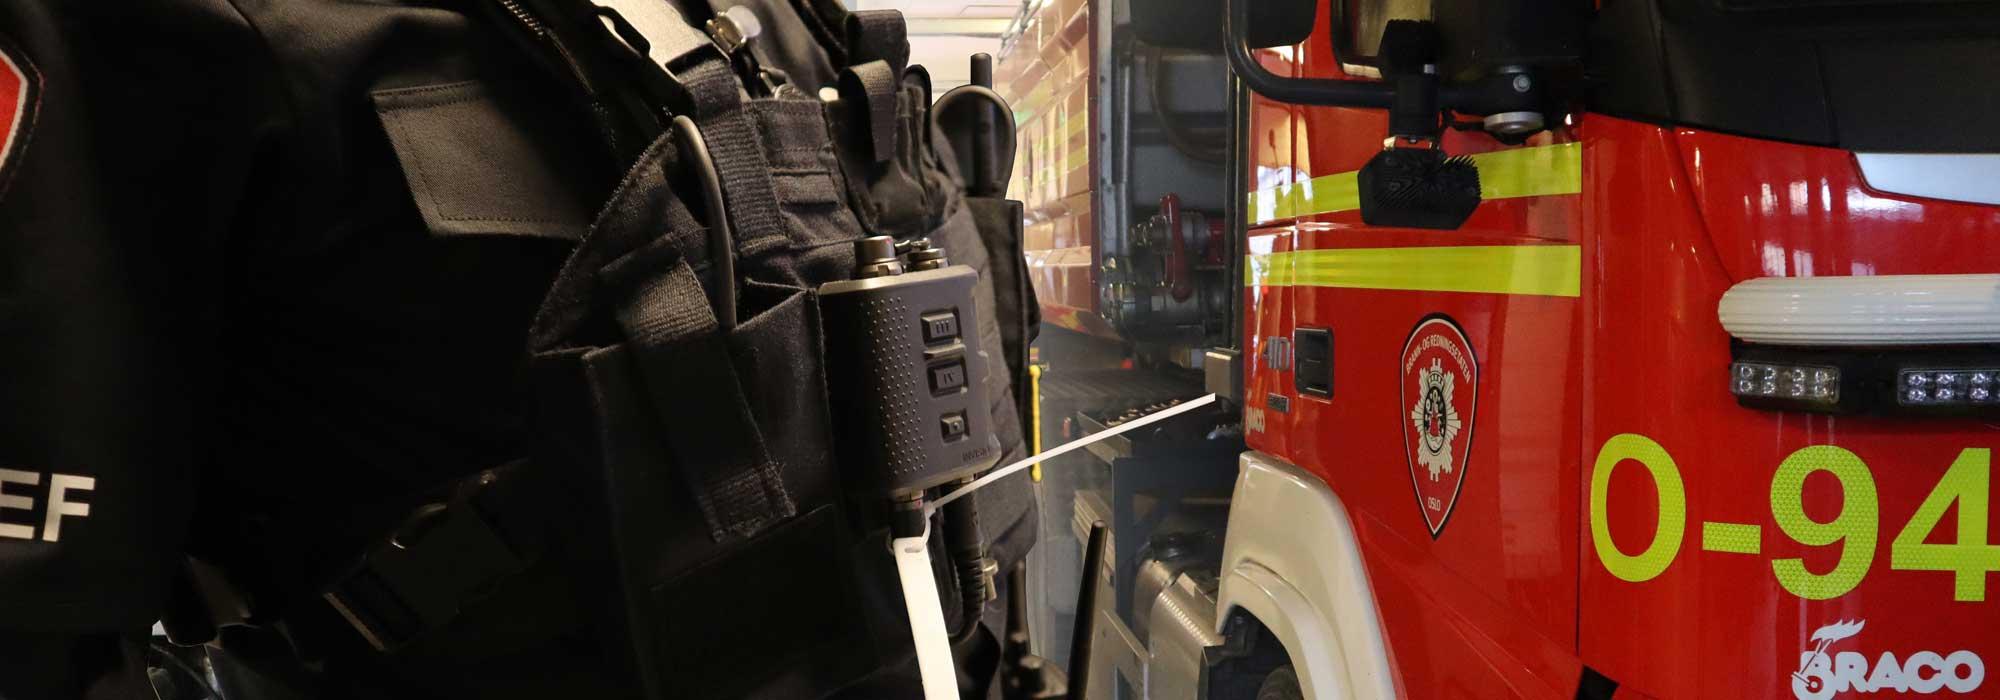 rfid utstyr brannmann brannbil